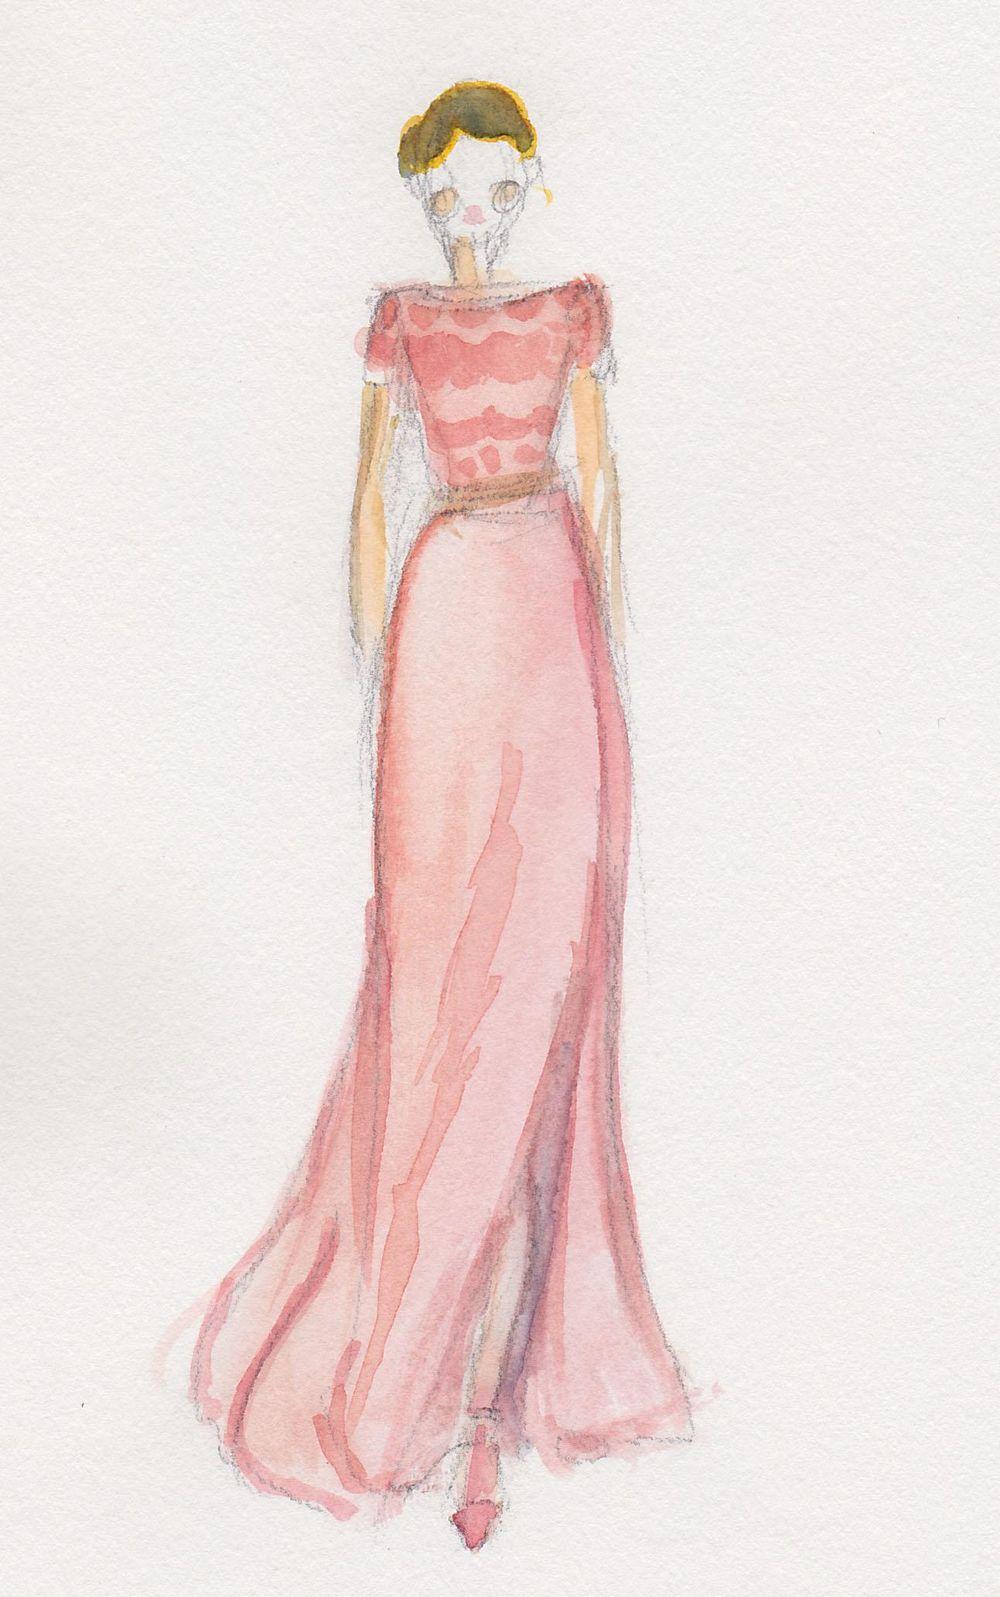 Final | Coral & Embellished - image 4 - student project